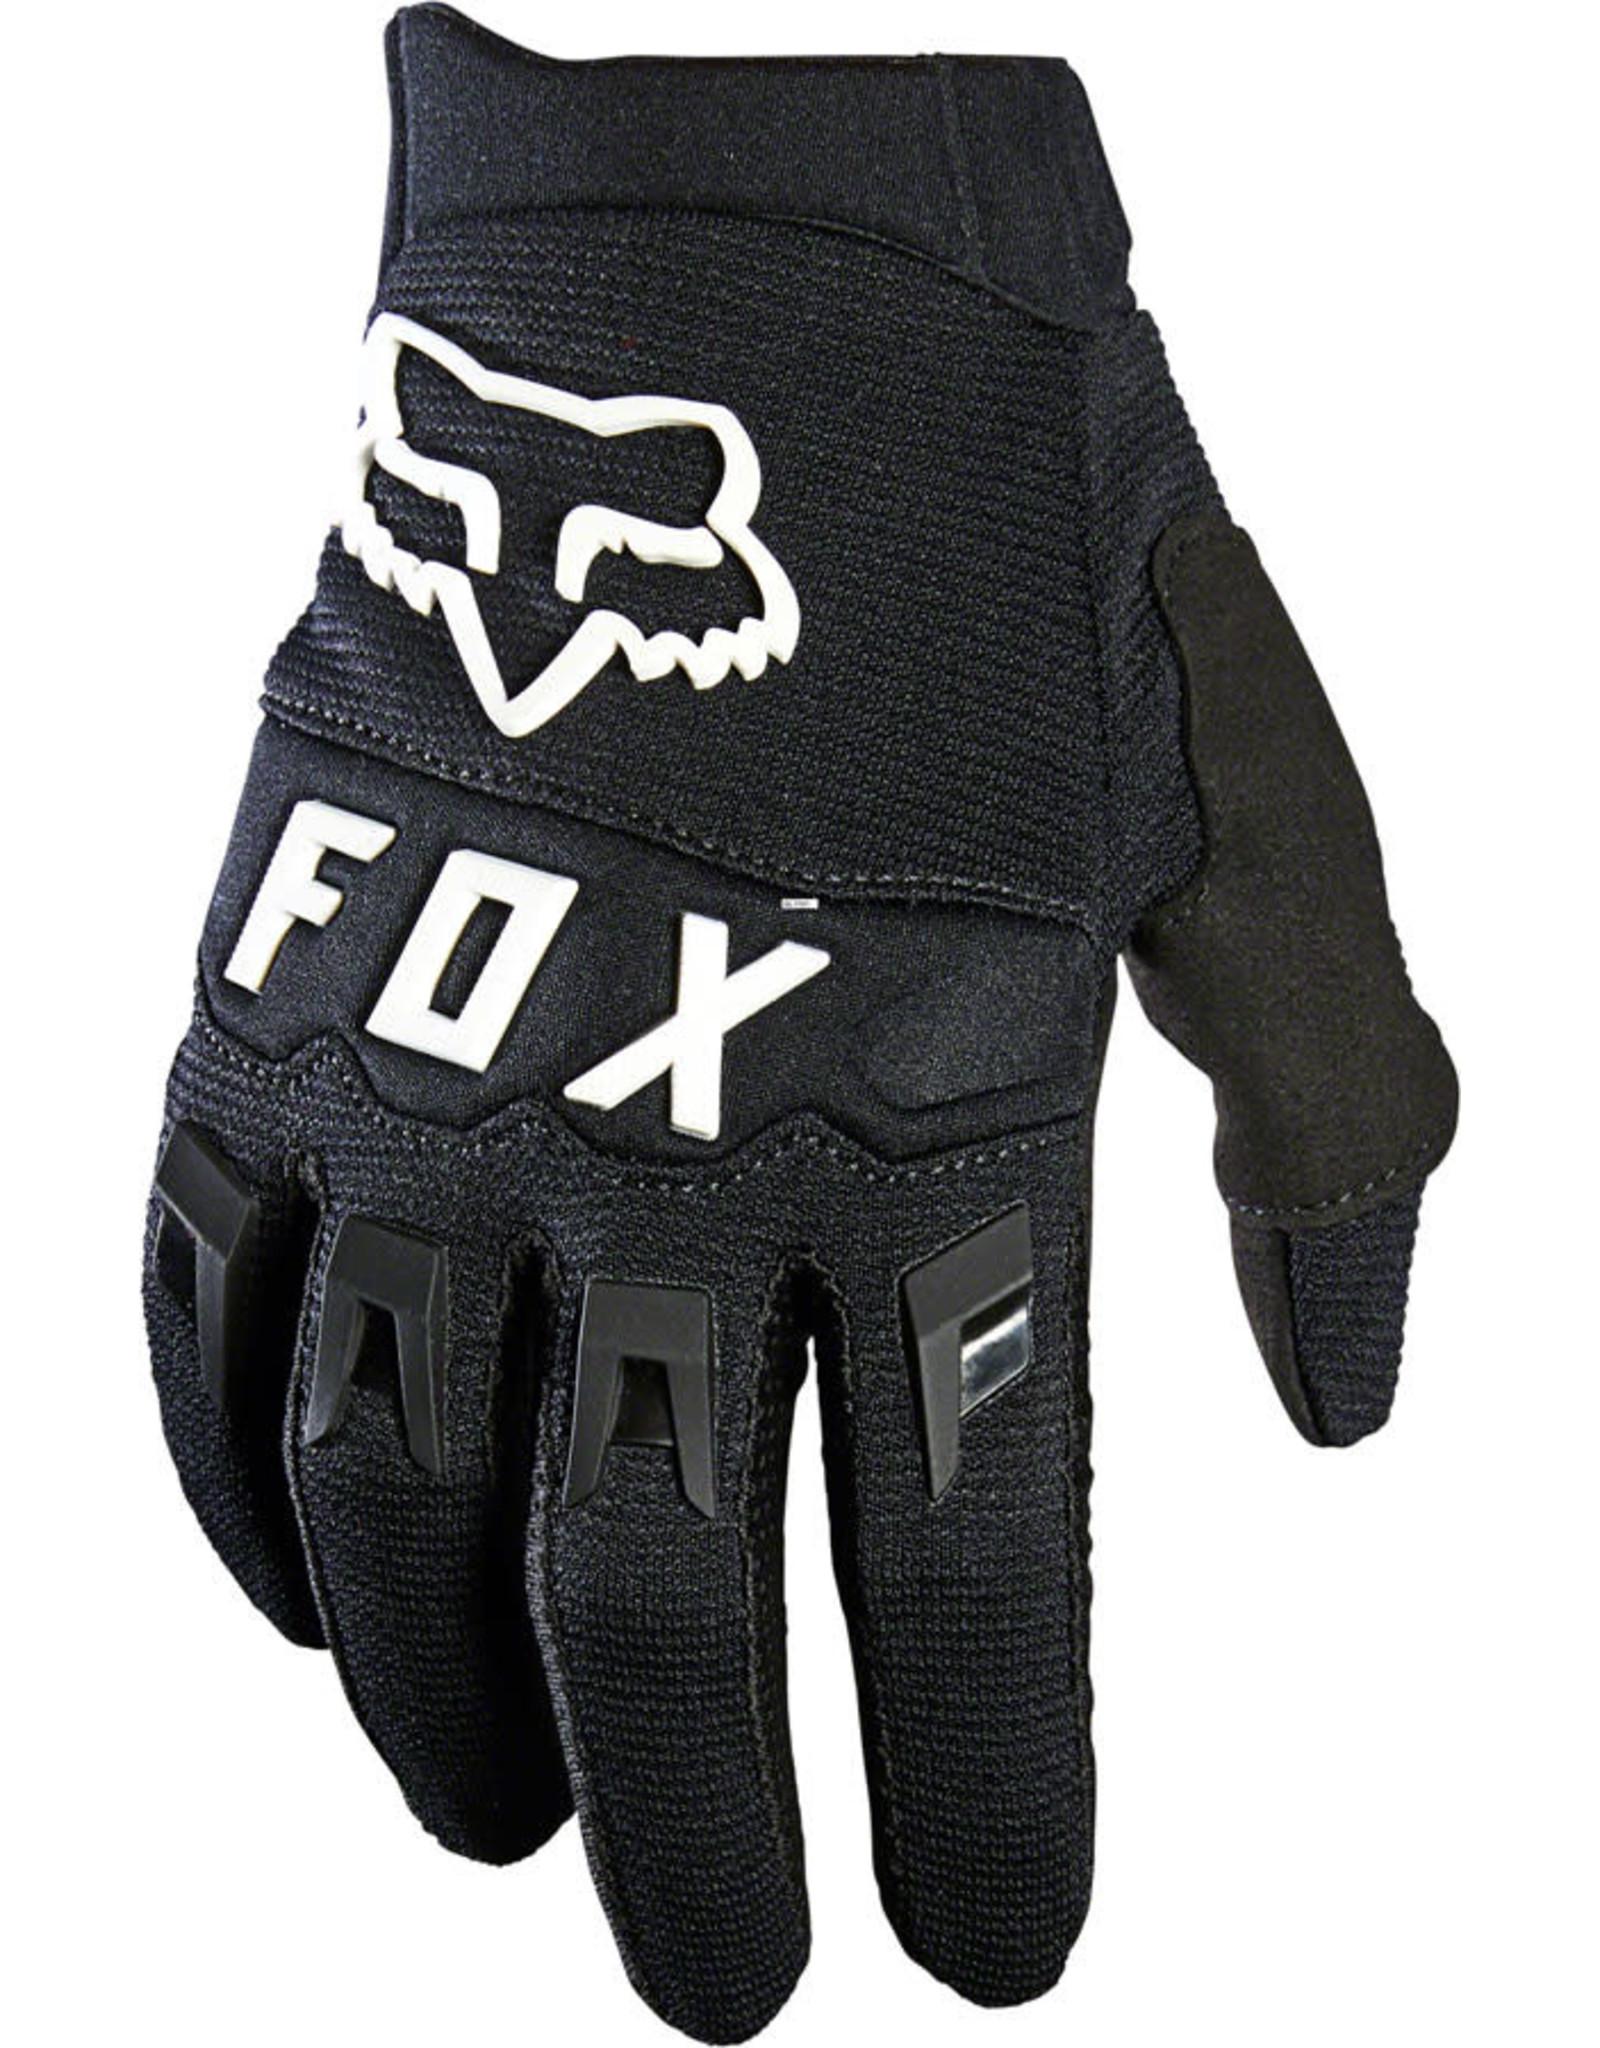 FOX KIDS DIRTPAW GLOVE